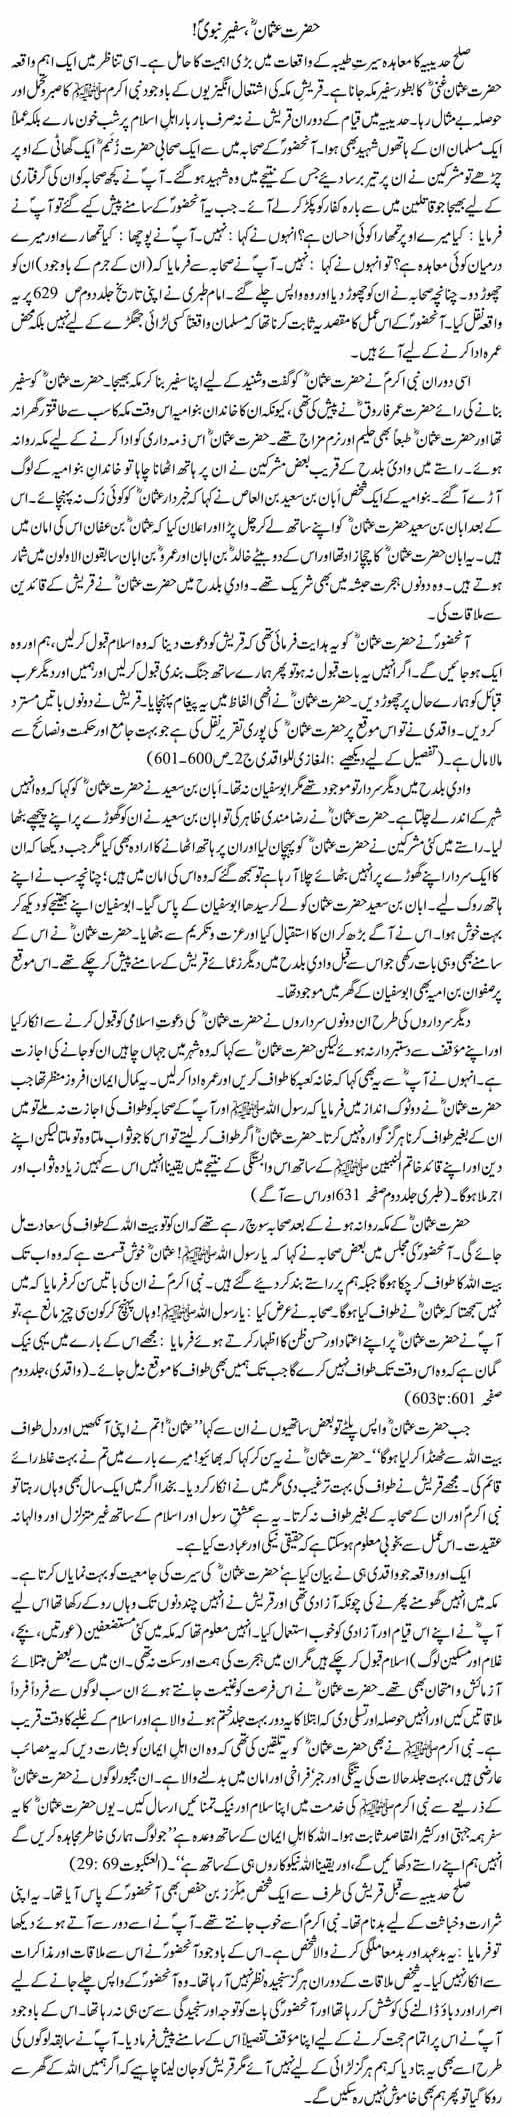 Hazrat Usman, Safeer Nabvi